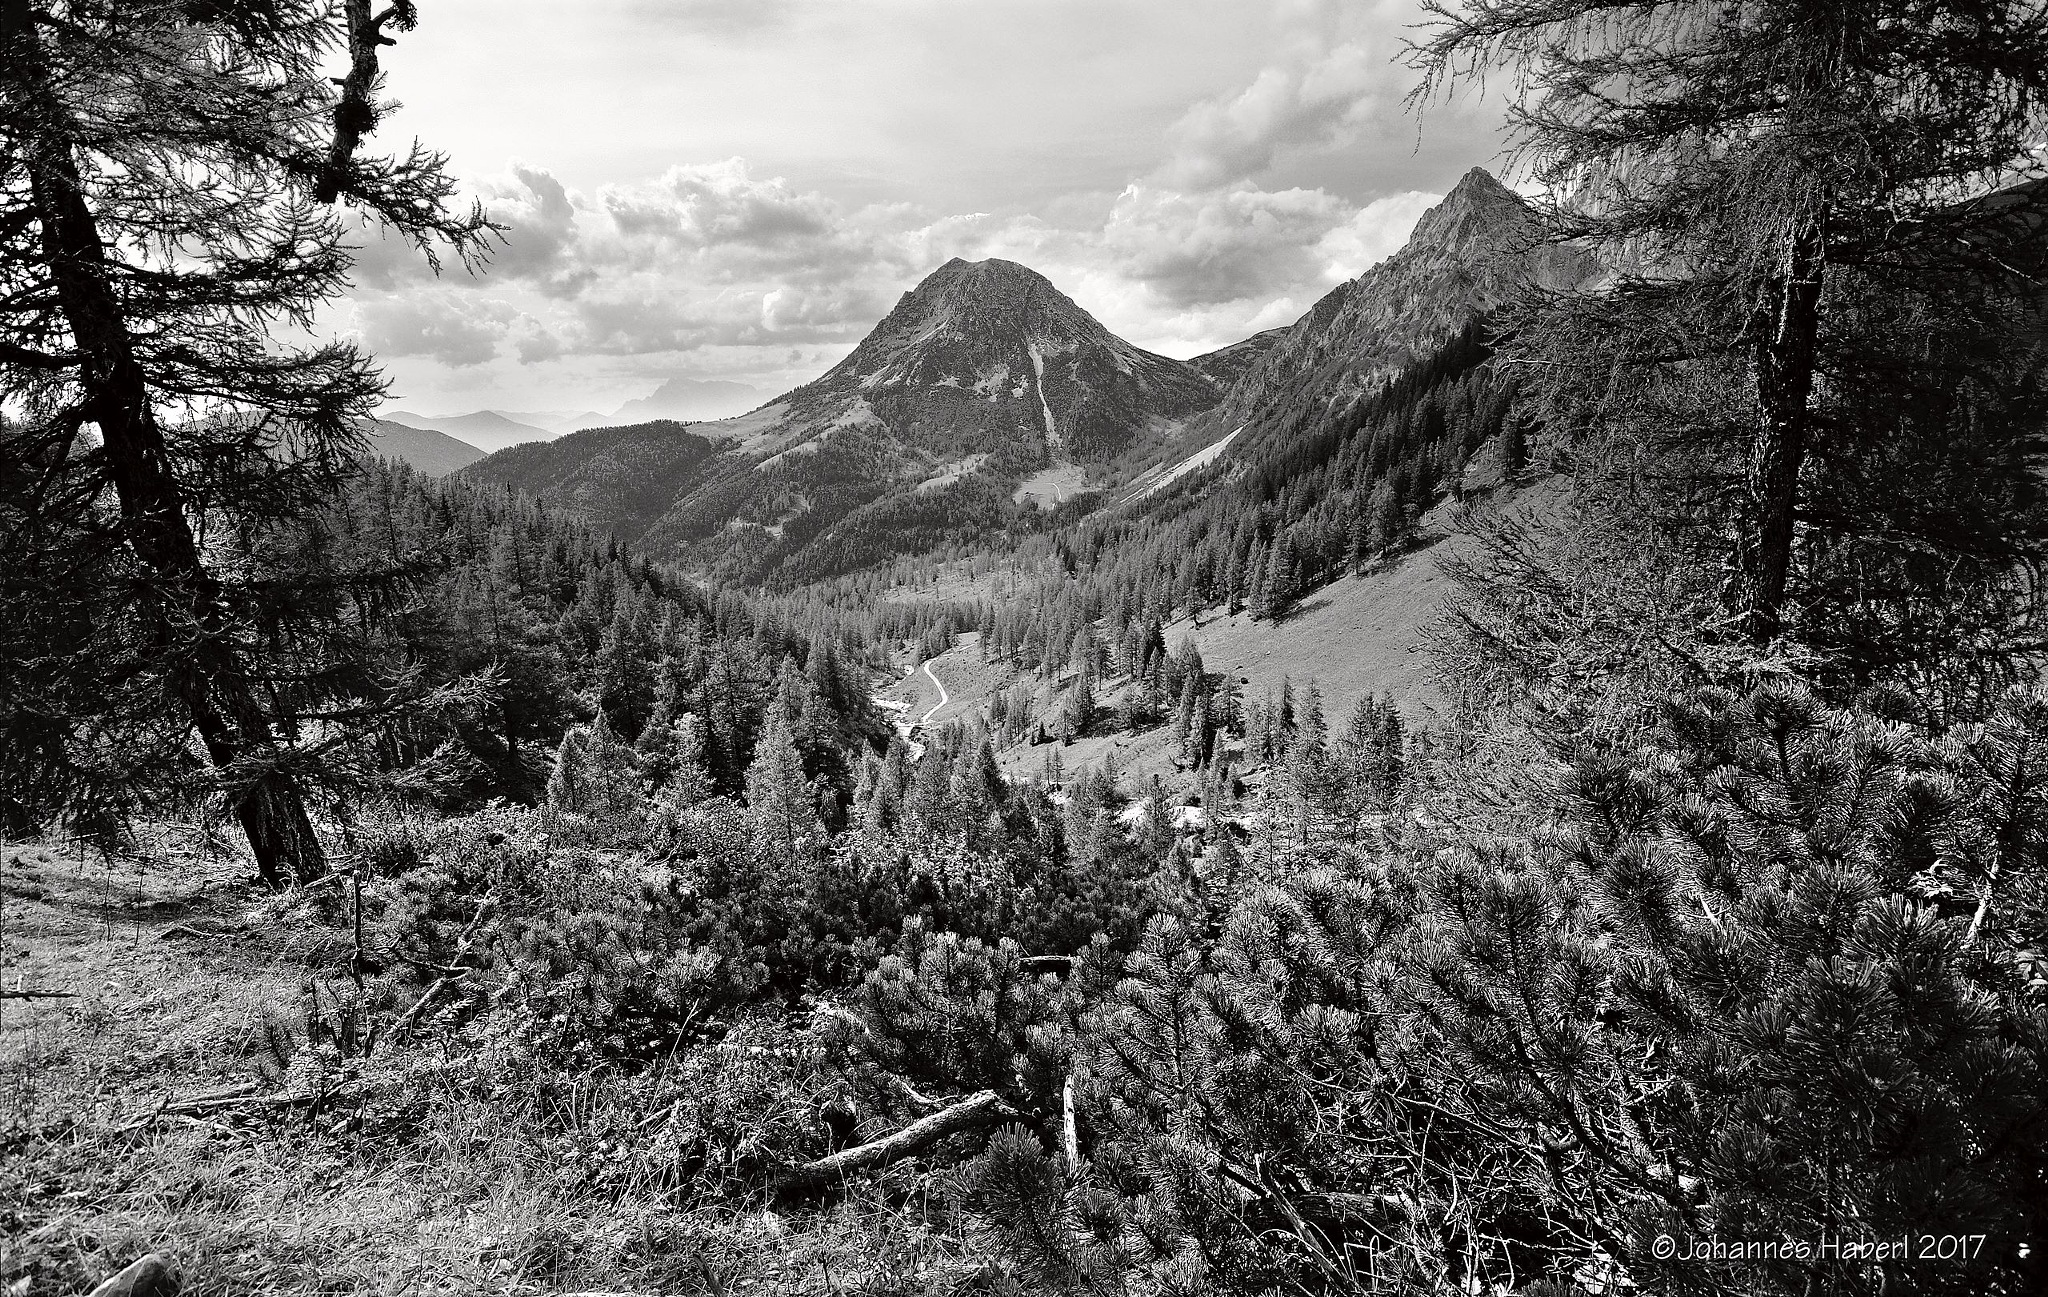 mountain pines, larchs, view to the valley & to Rettenstein (Röthelstein) / B&W by Johannes Haberl